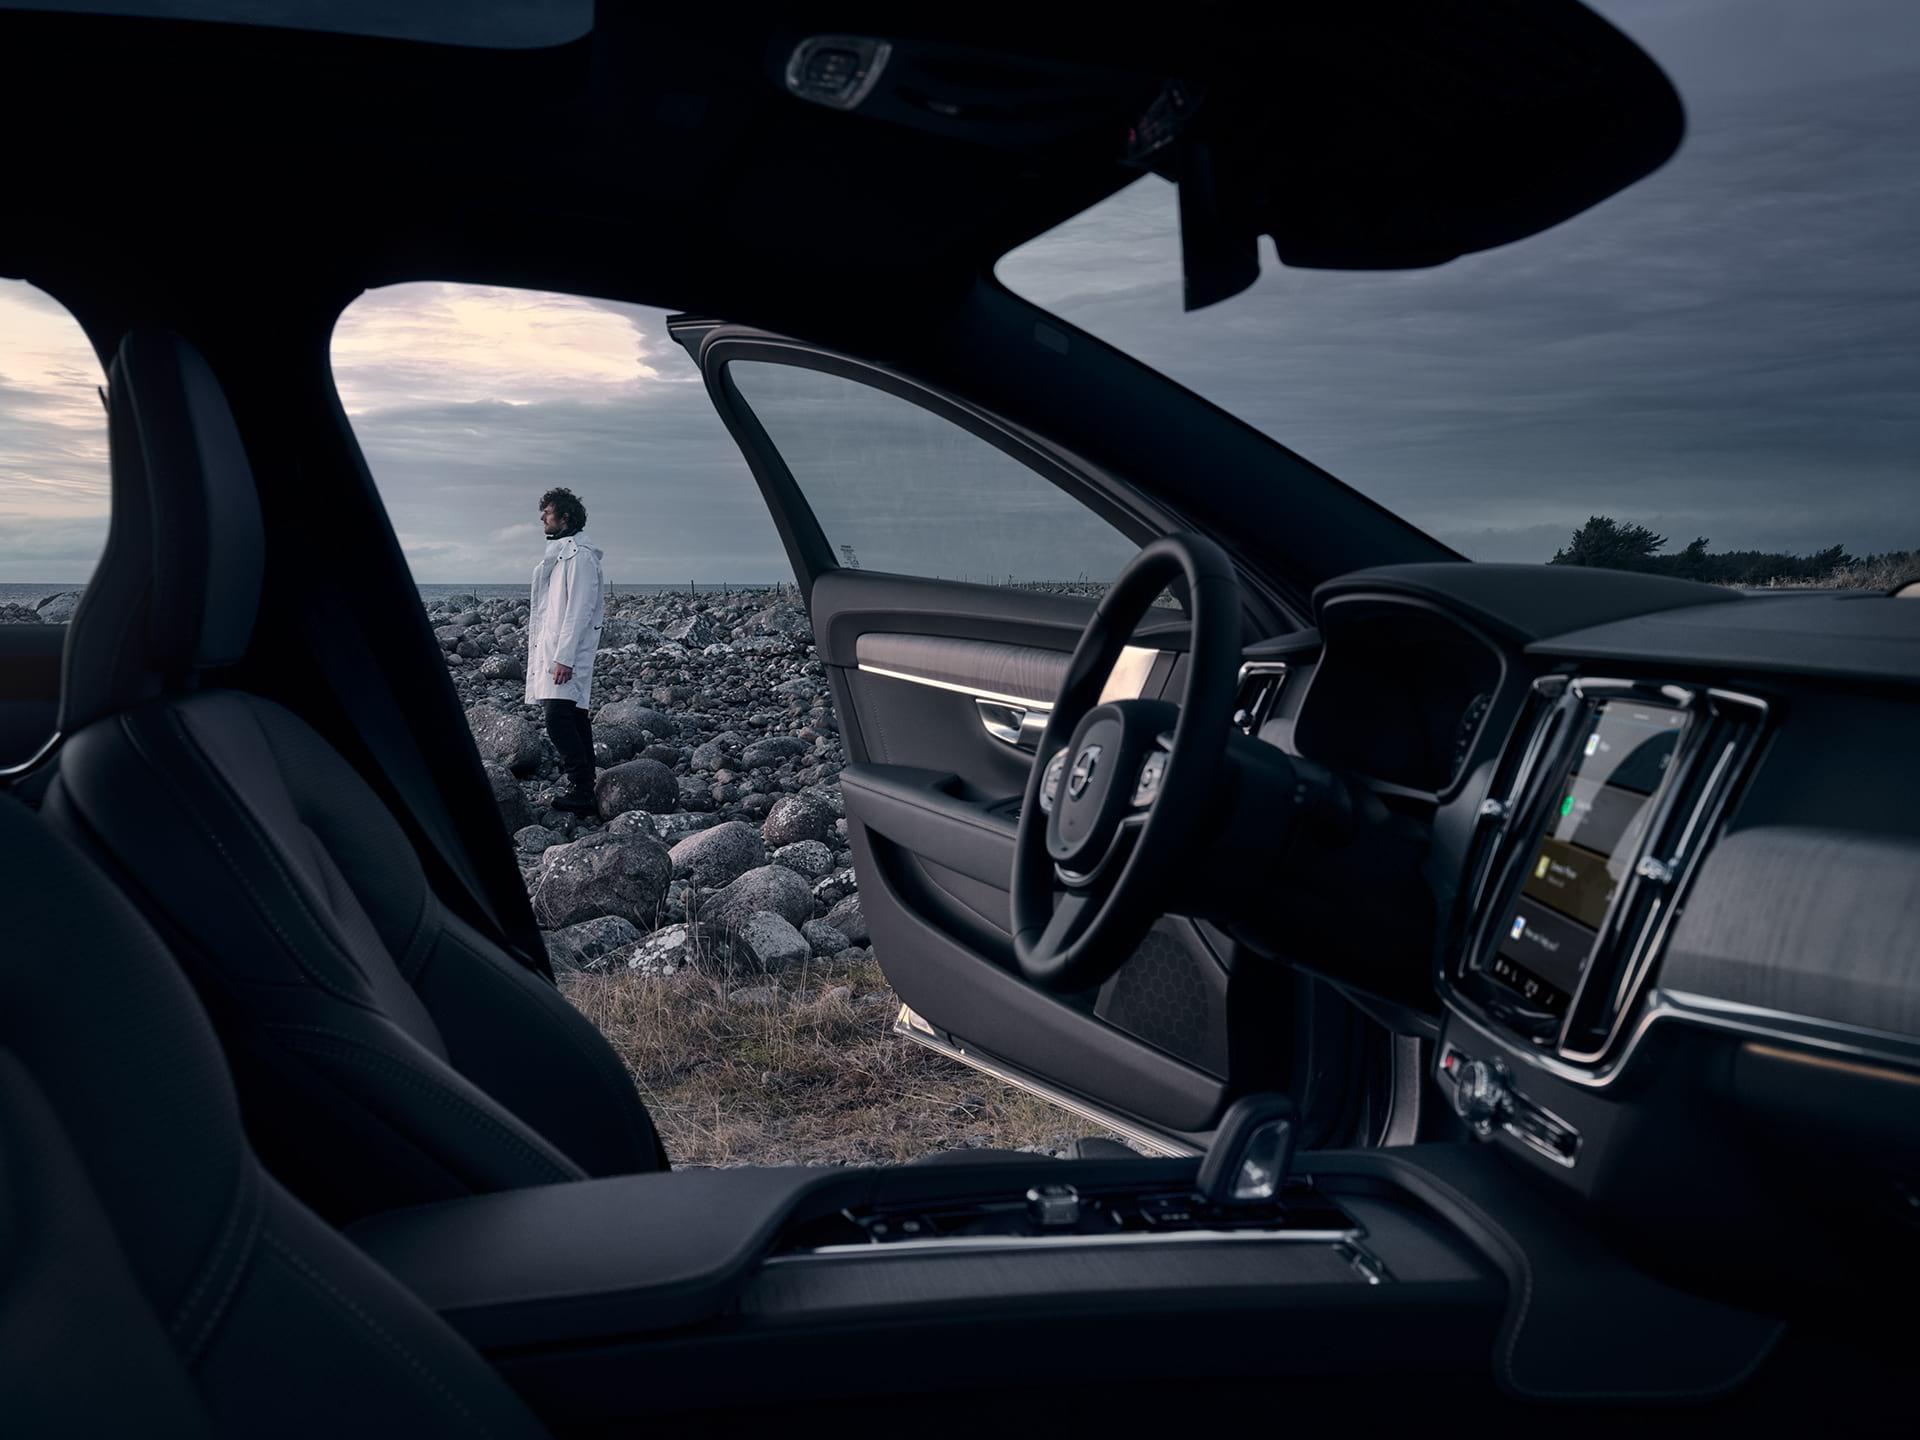 I en V90 Cross Country med svart interiør, en mann står på utsiden.